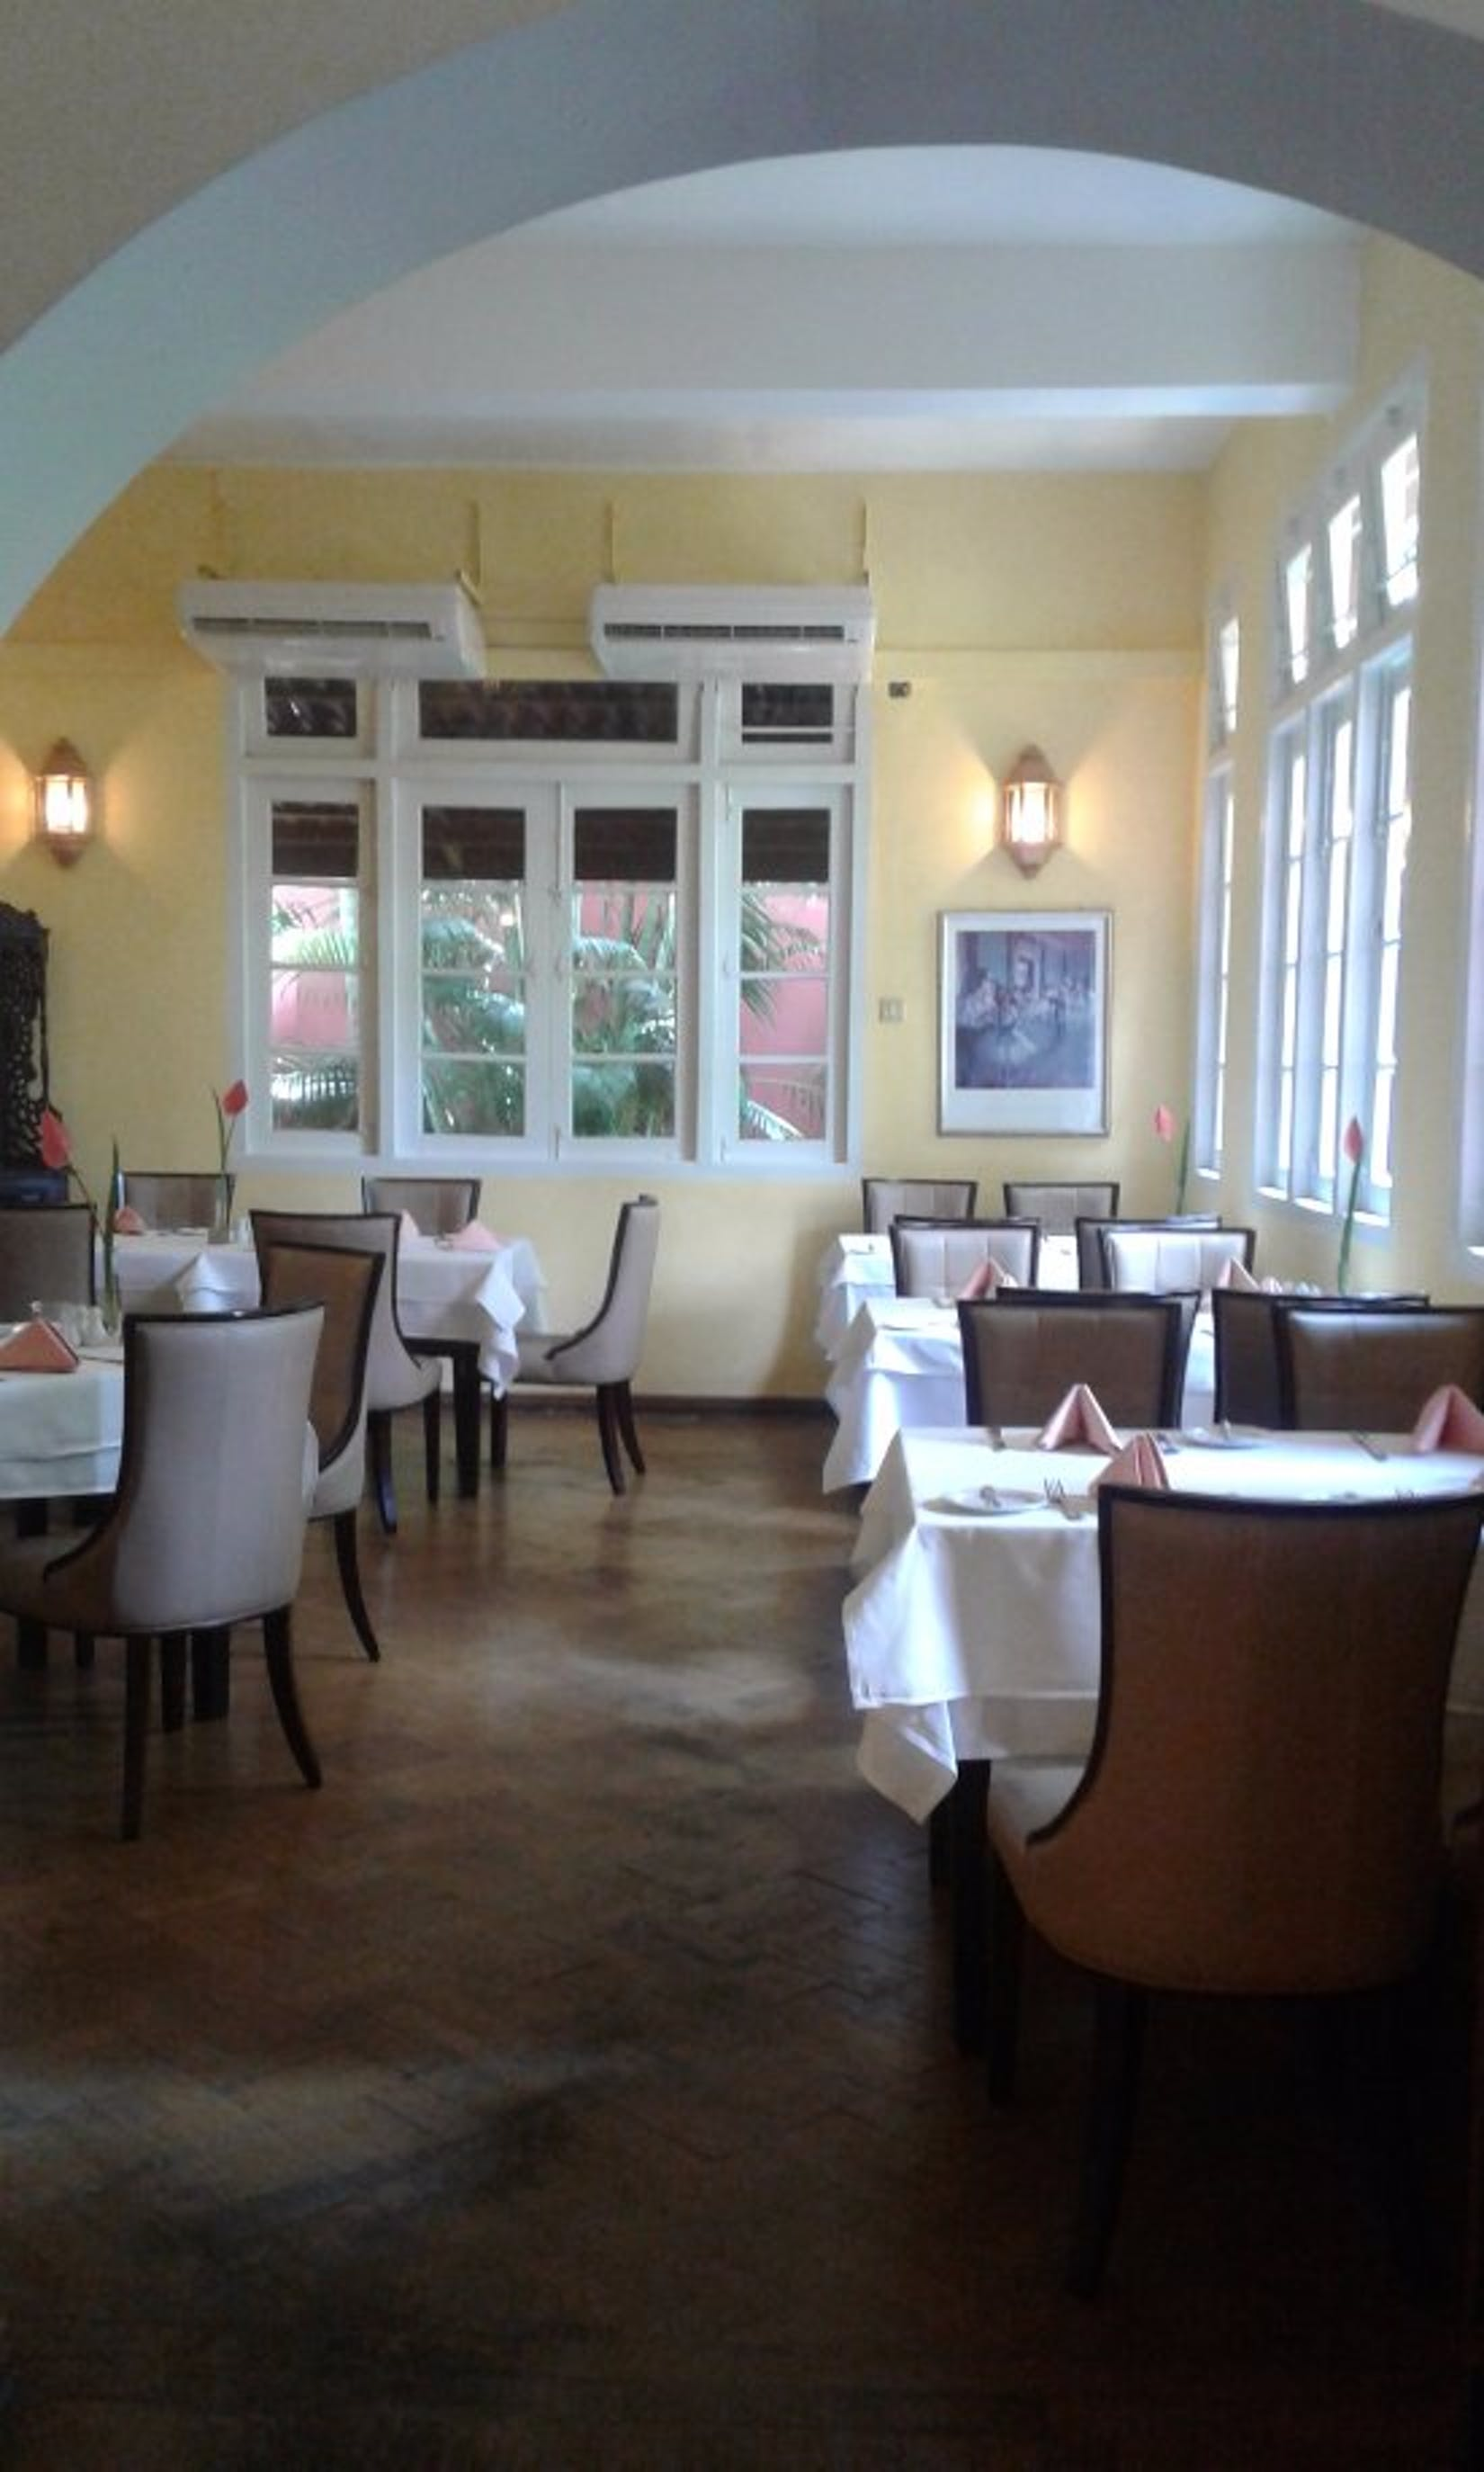 L'Opera Italian Restaurant & Bar (at Inya Lake) | yathar